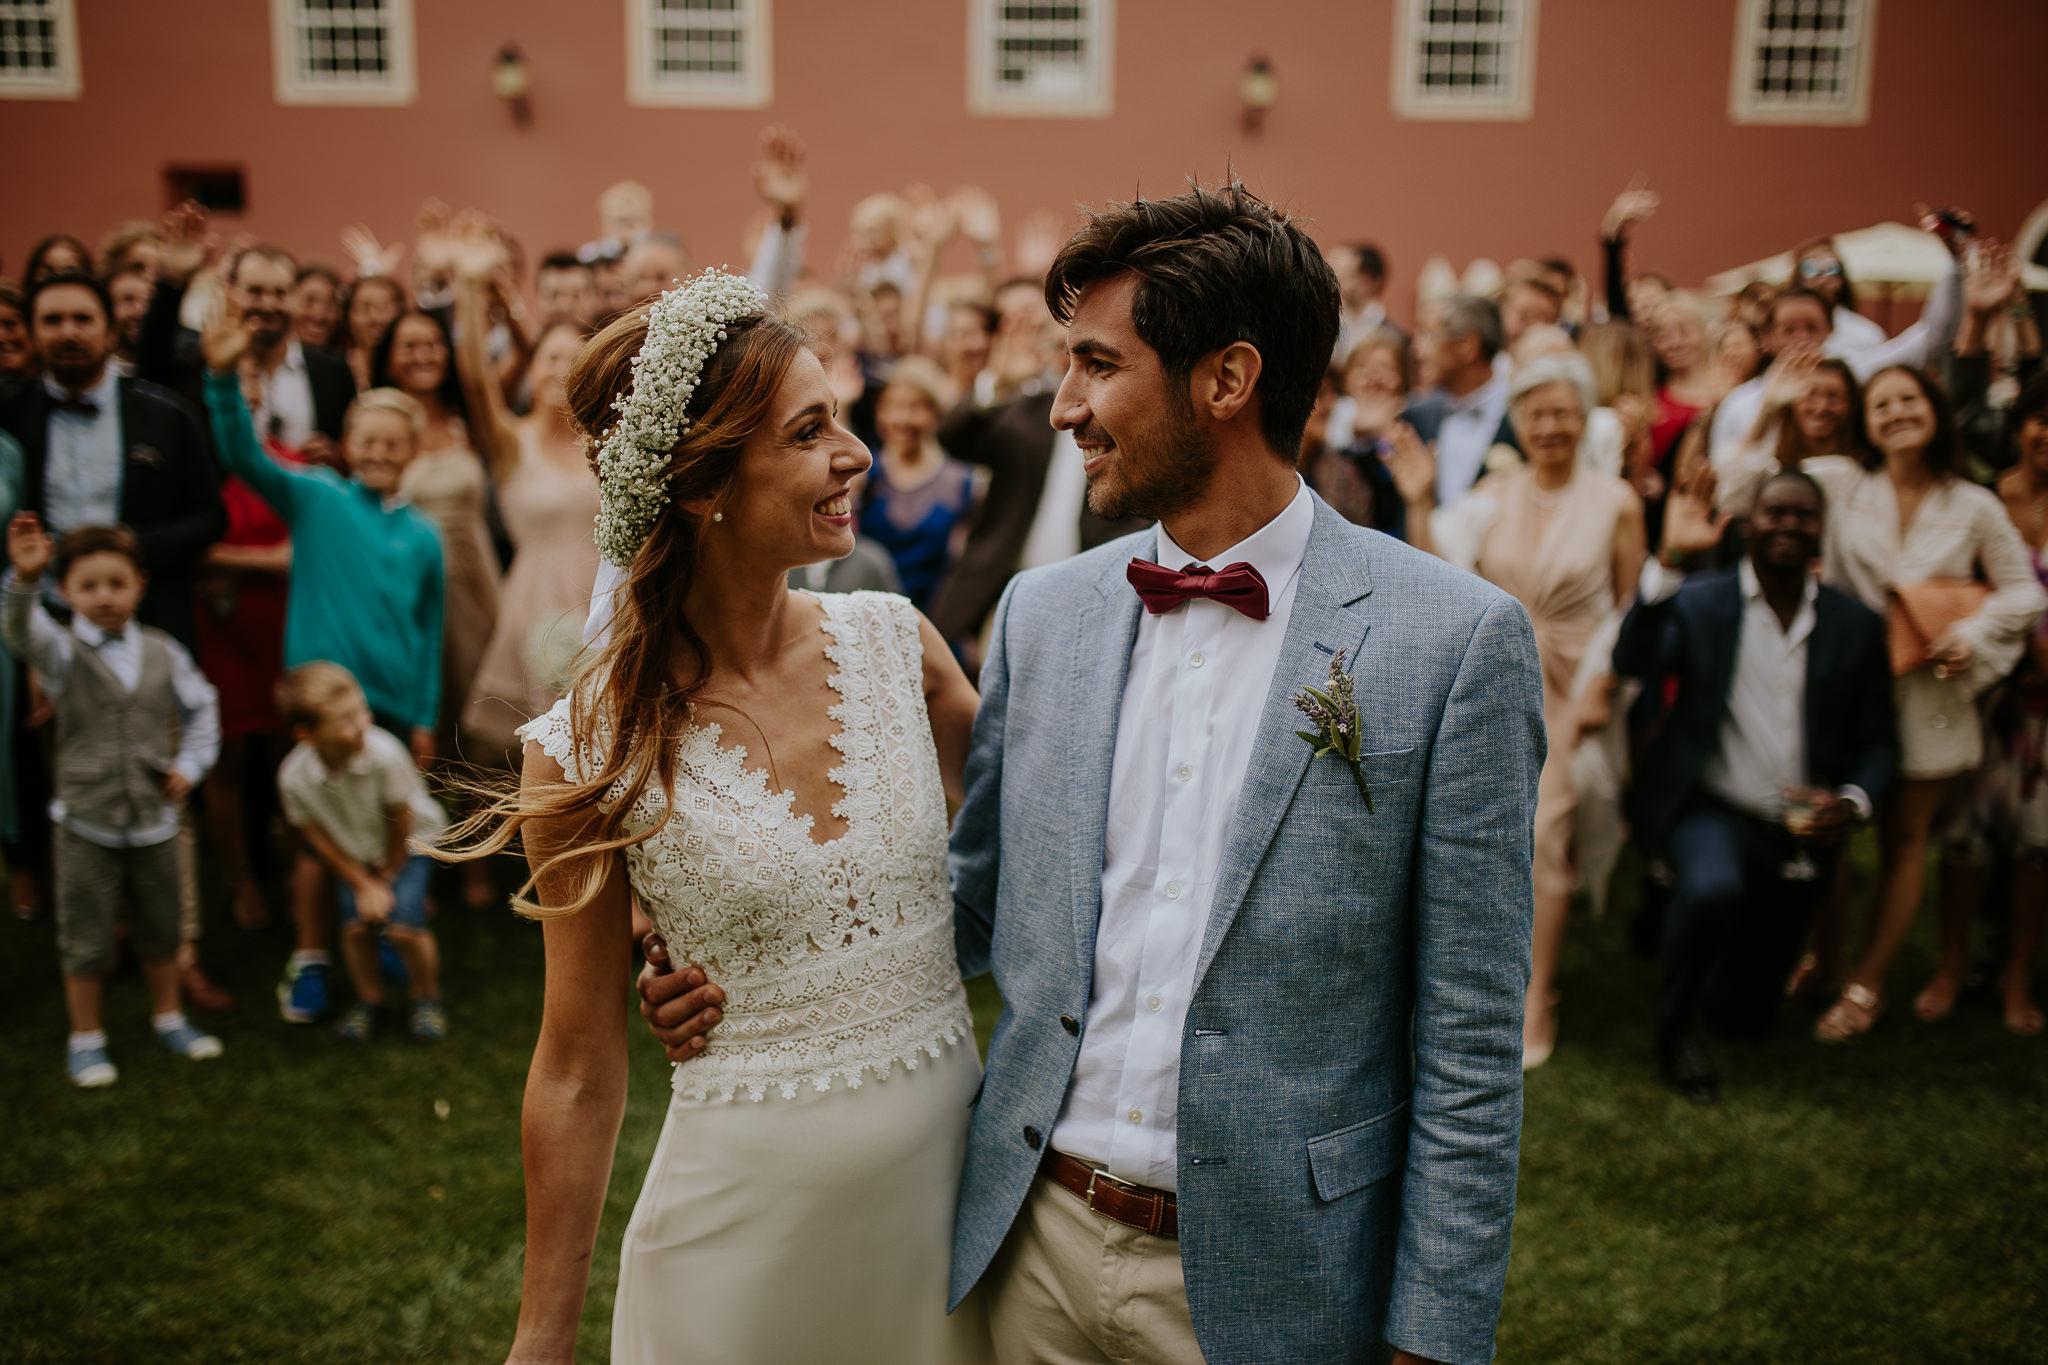 romina_thomas_destination_wedding_photography_fotografia_de_casamento_lisbon_sintra_penha_longa_resort-55